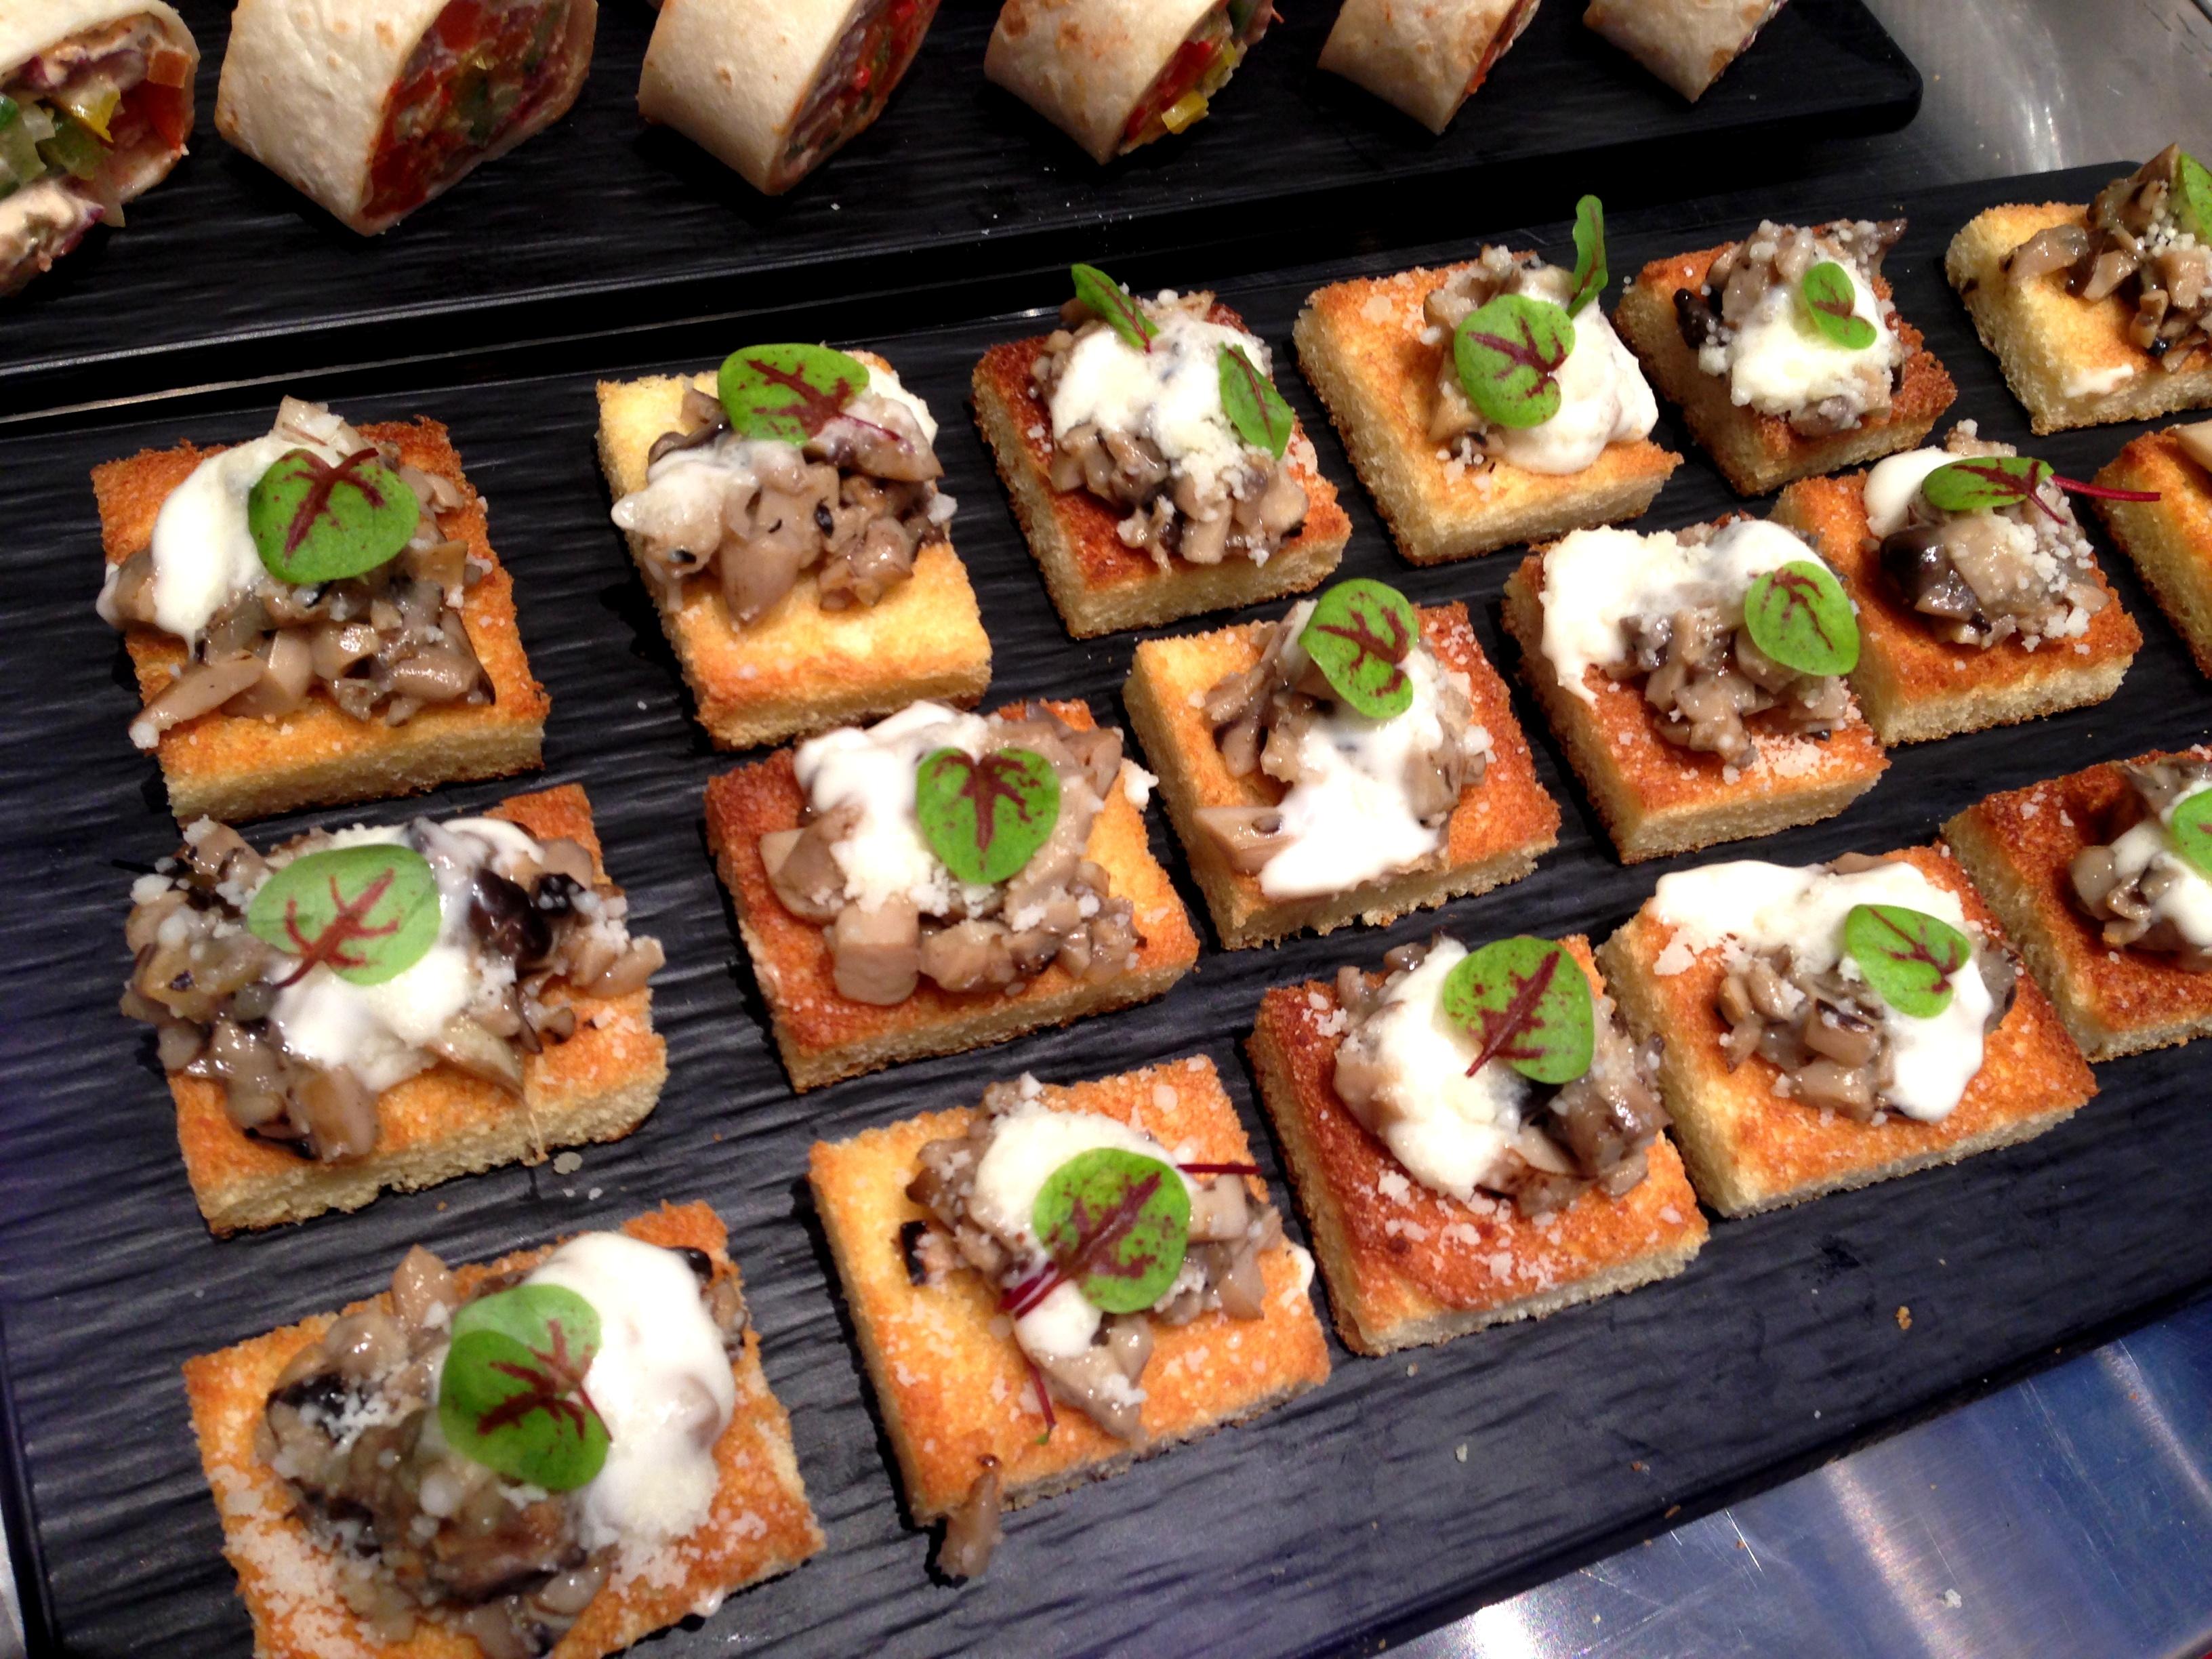 Sauteed Mixed Mushroom Bruschetta